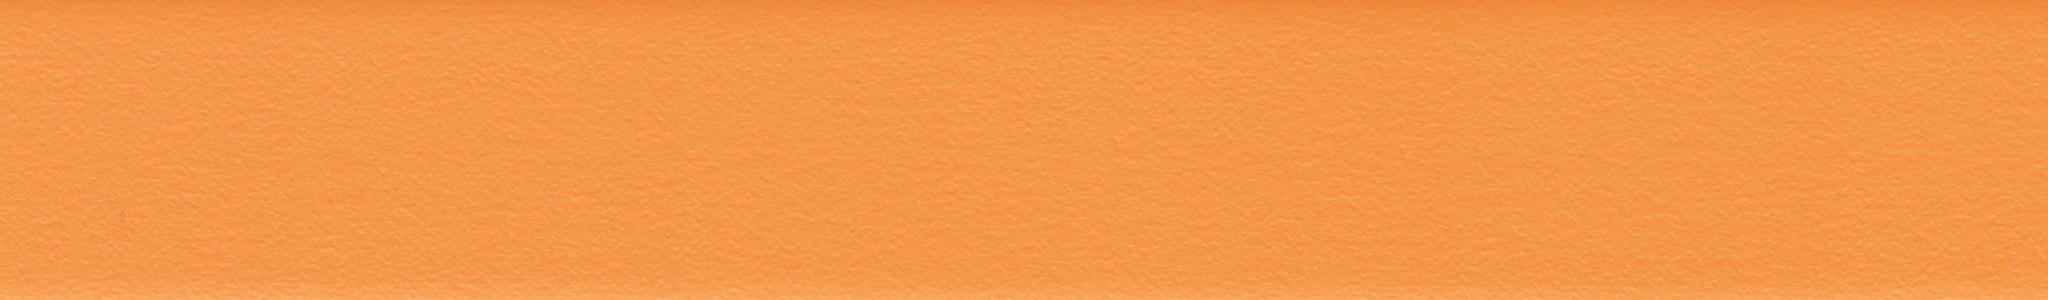 HU 142645 ABS Kante UNI Orange feinperl 107